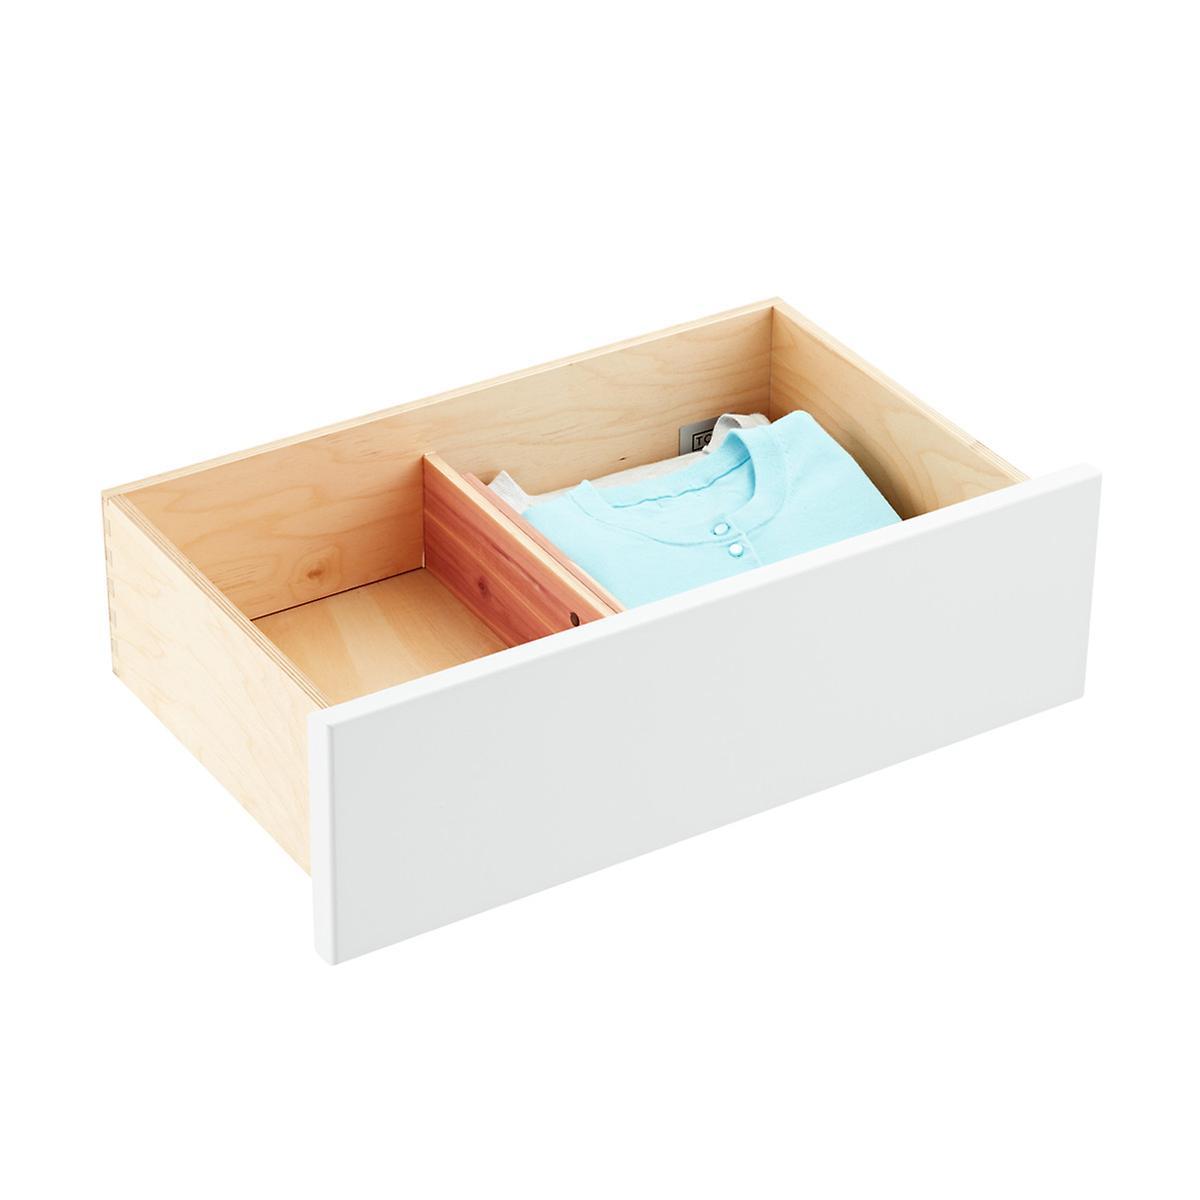 Cedar Adjustable Drawer Organizer | The Container Store